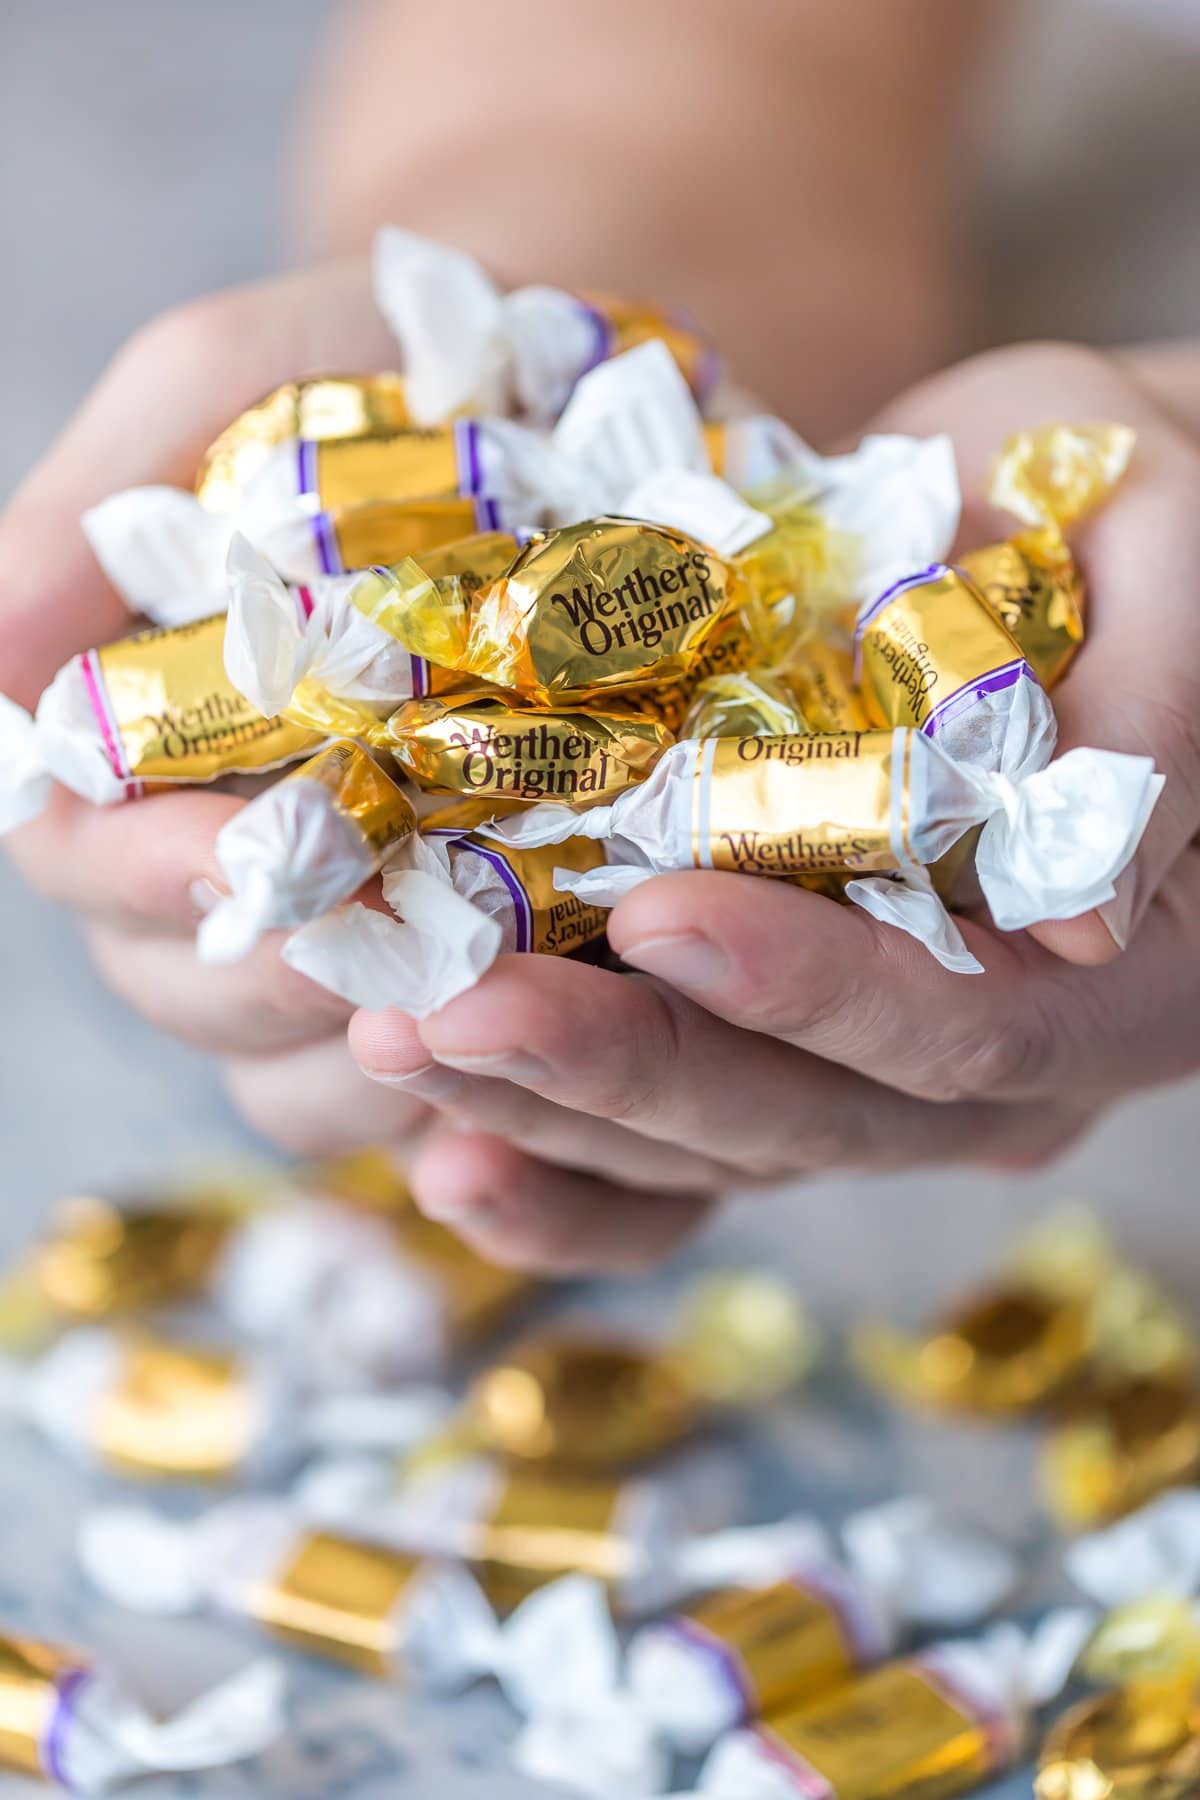 werthers original caramels to celebrate National Caramel Day